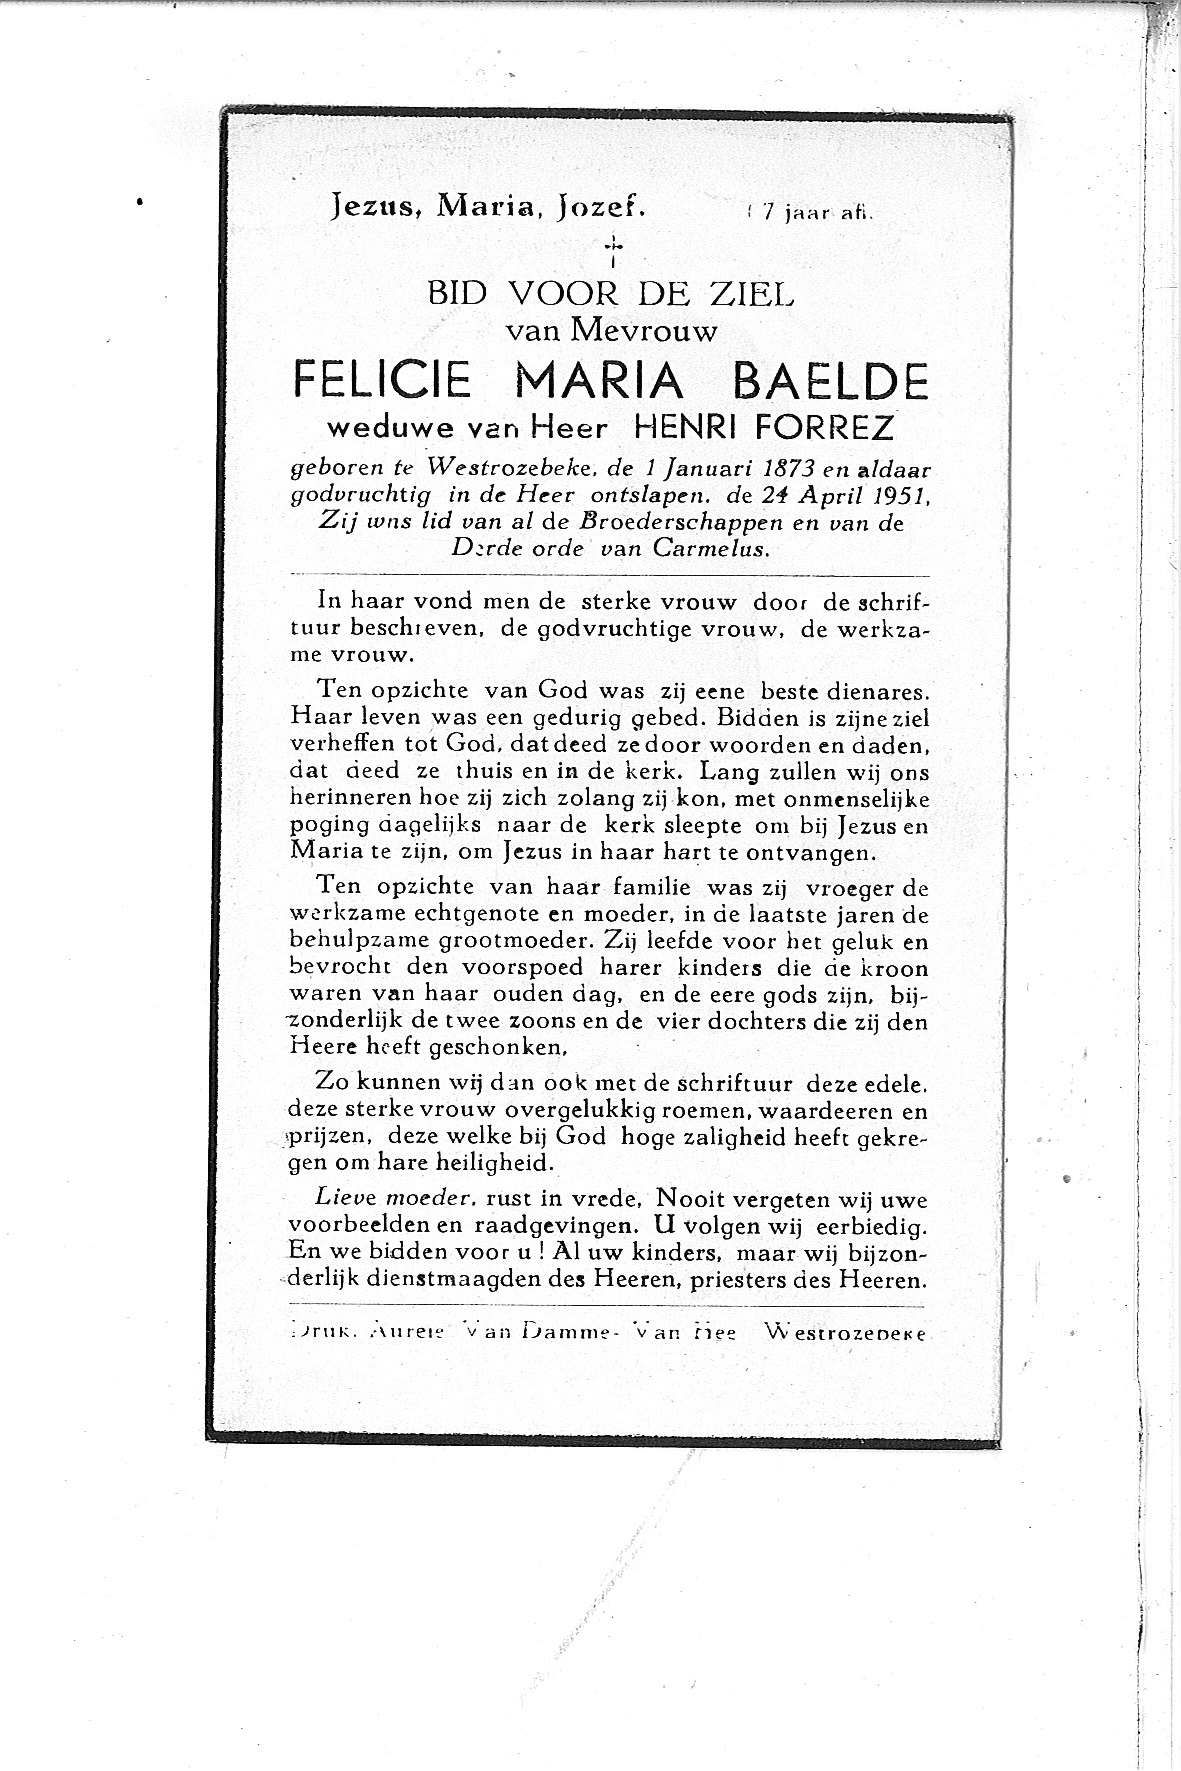 Felicie-Maria(1951)20100928110430_00027.jpg